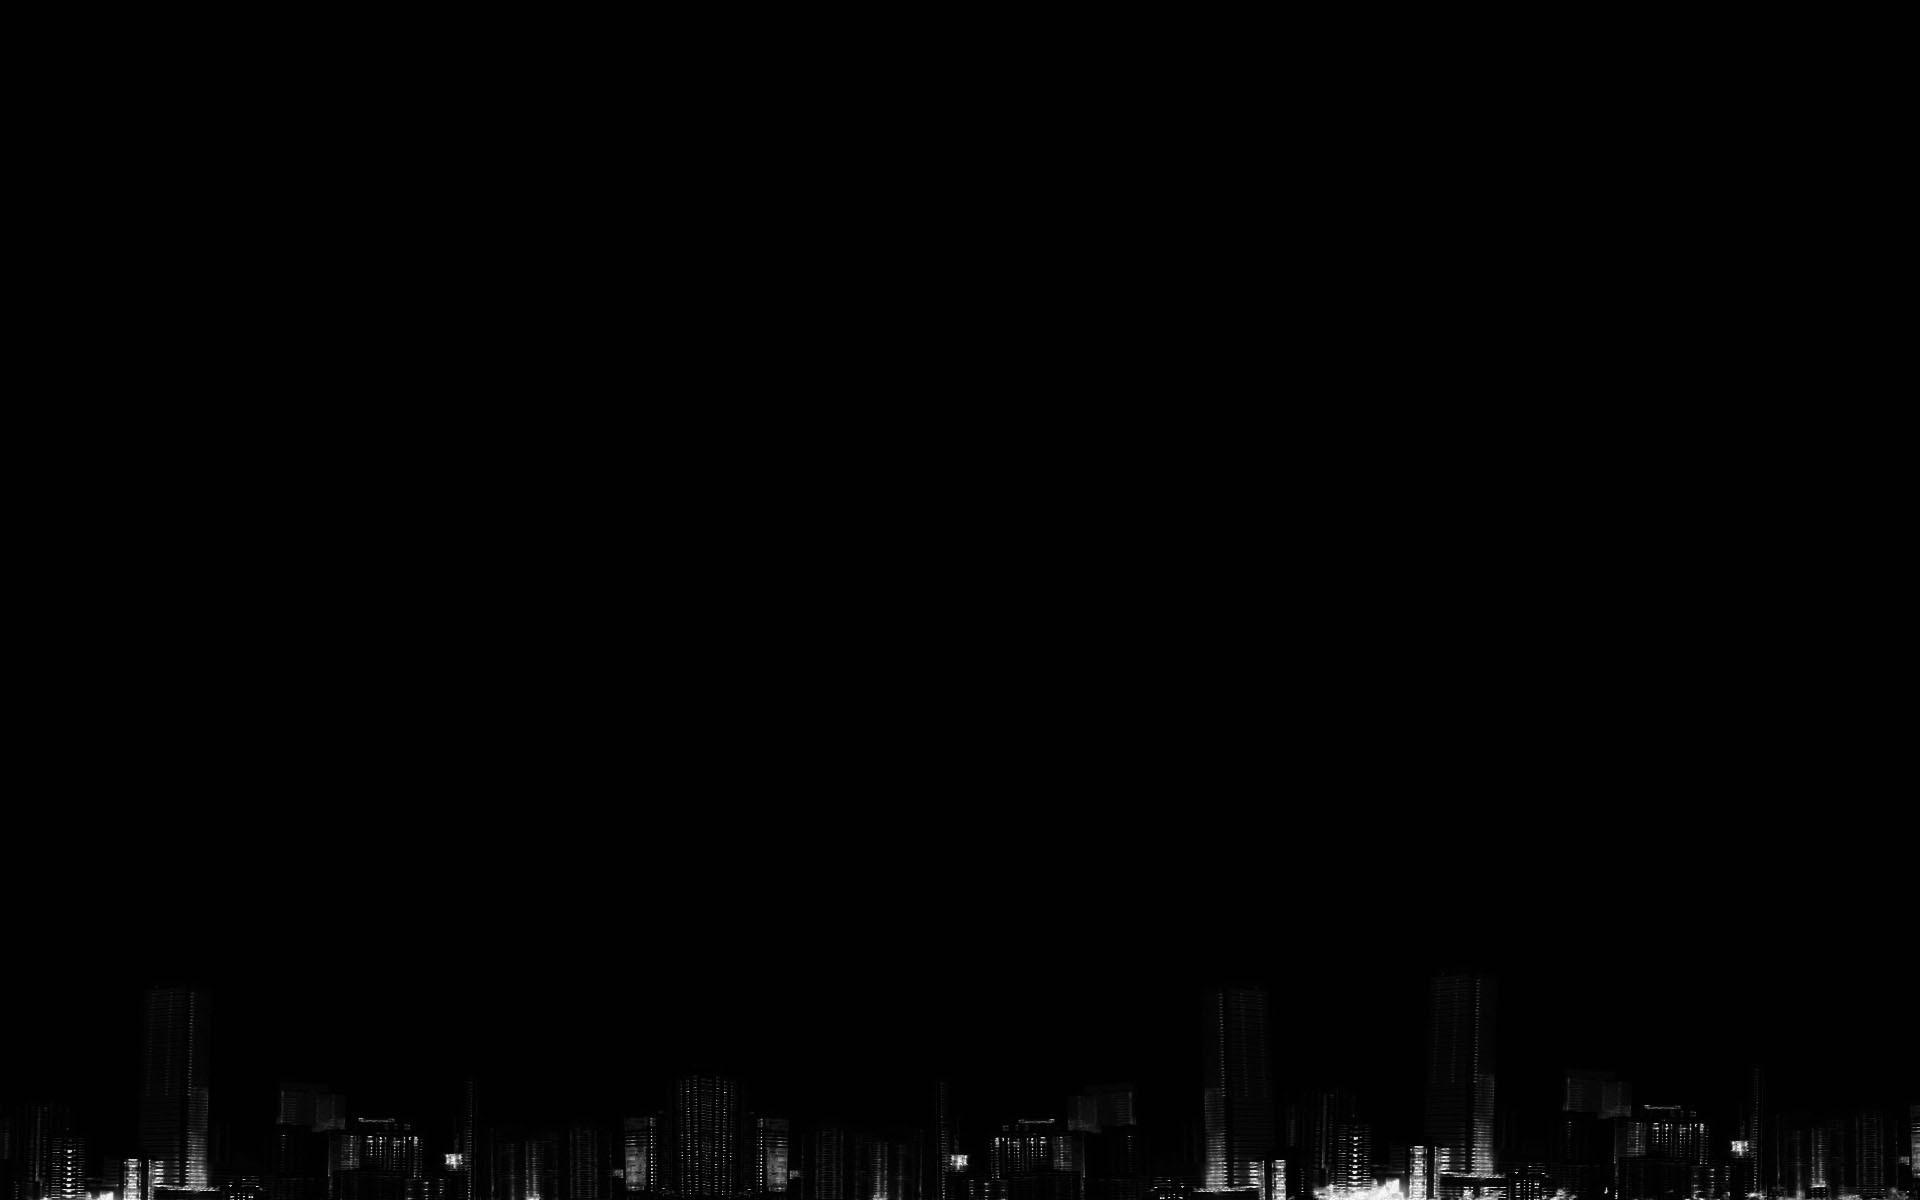 Black Wallpaper Hd wallpaper – 623637